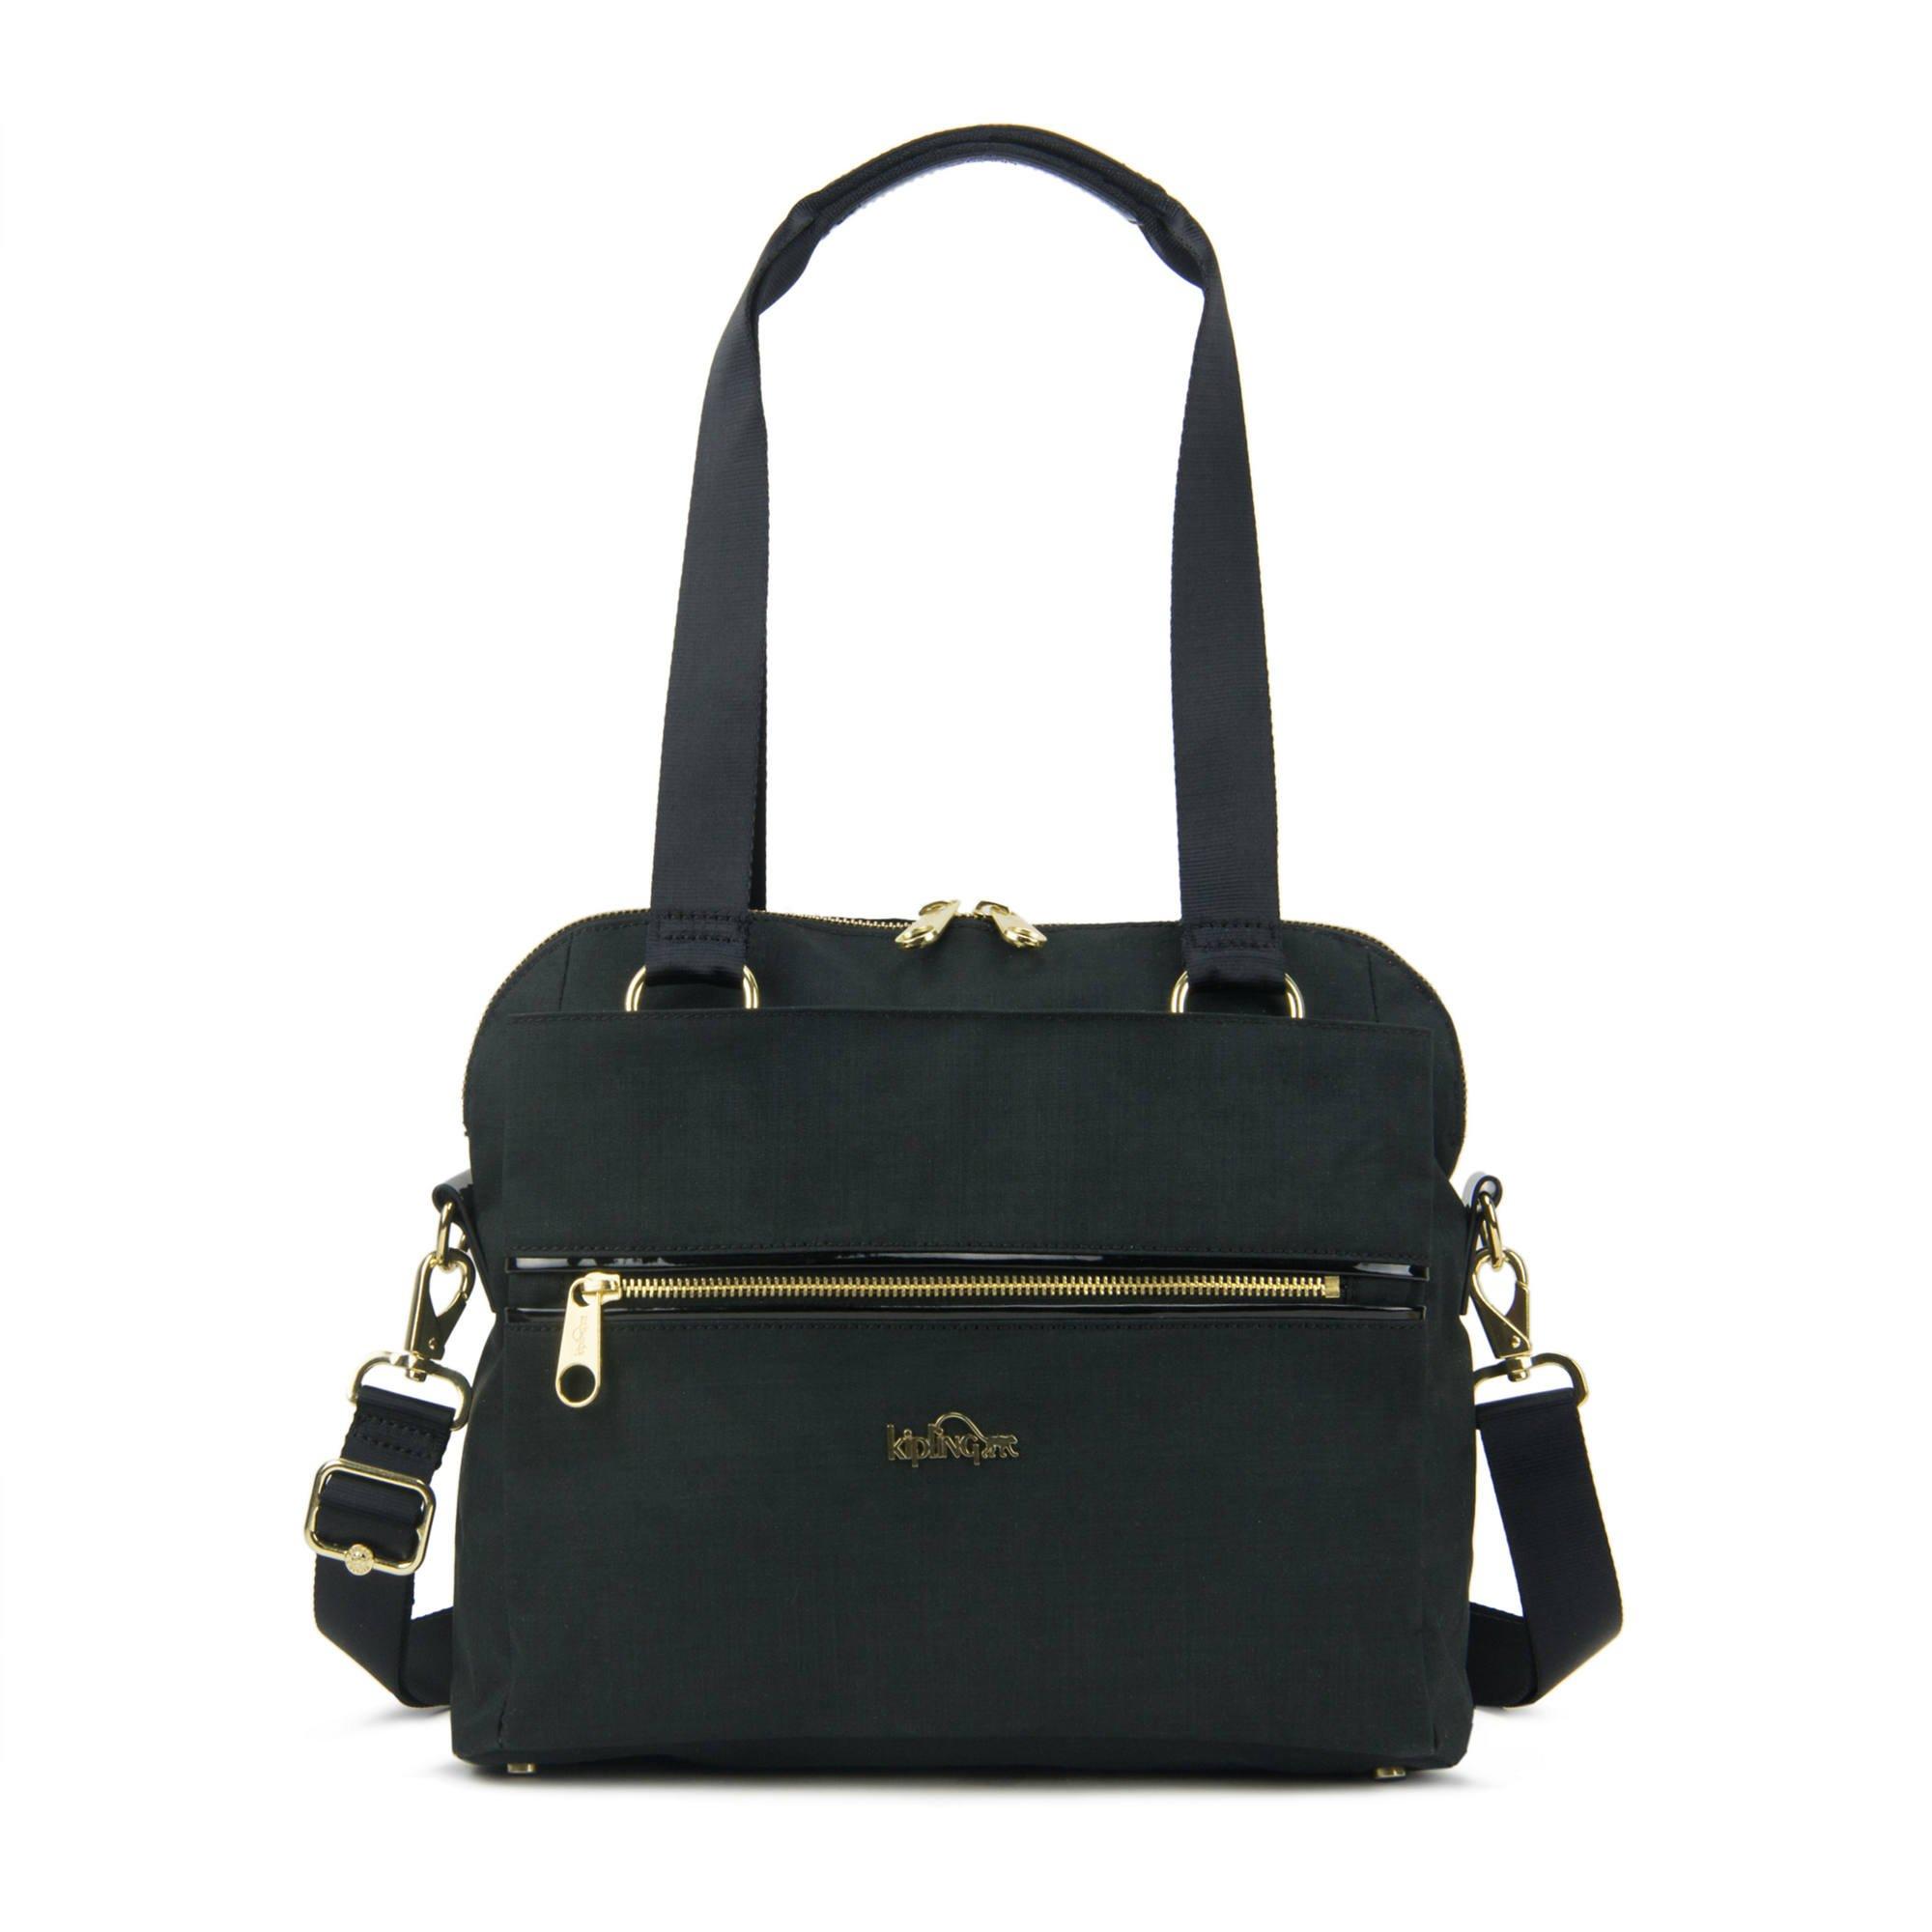 Kipling Women's Catelyn Handbag One Size Black Crosshatch